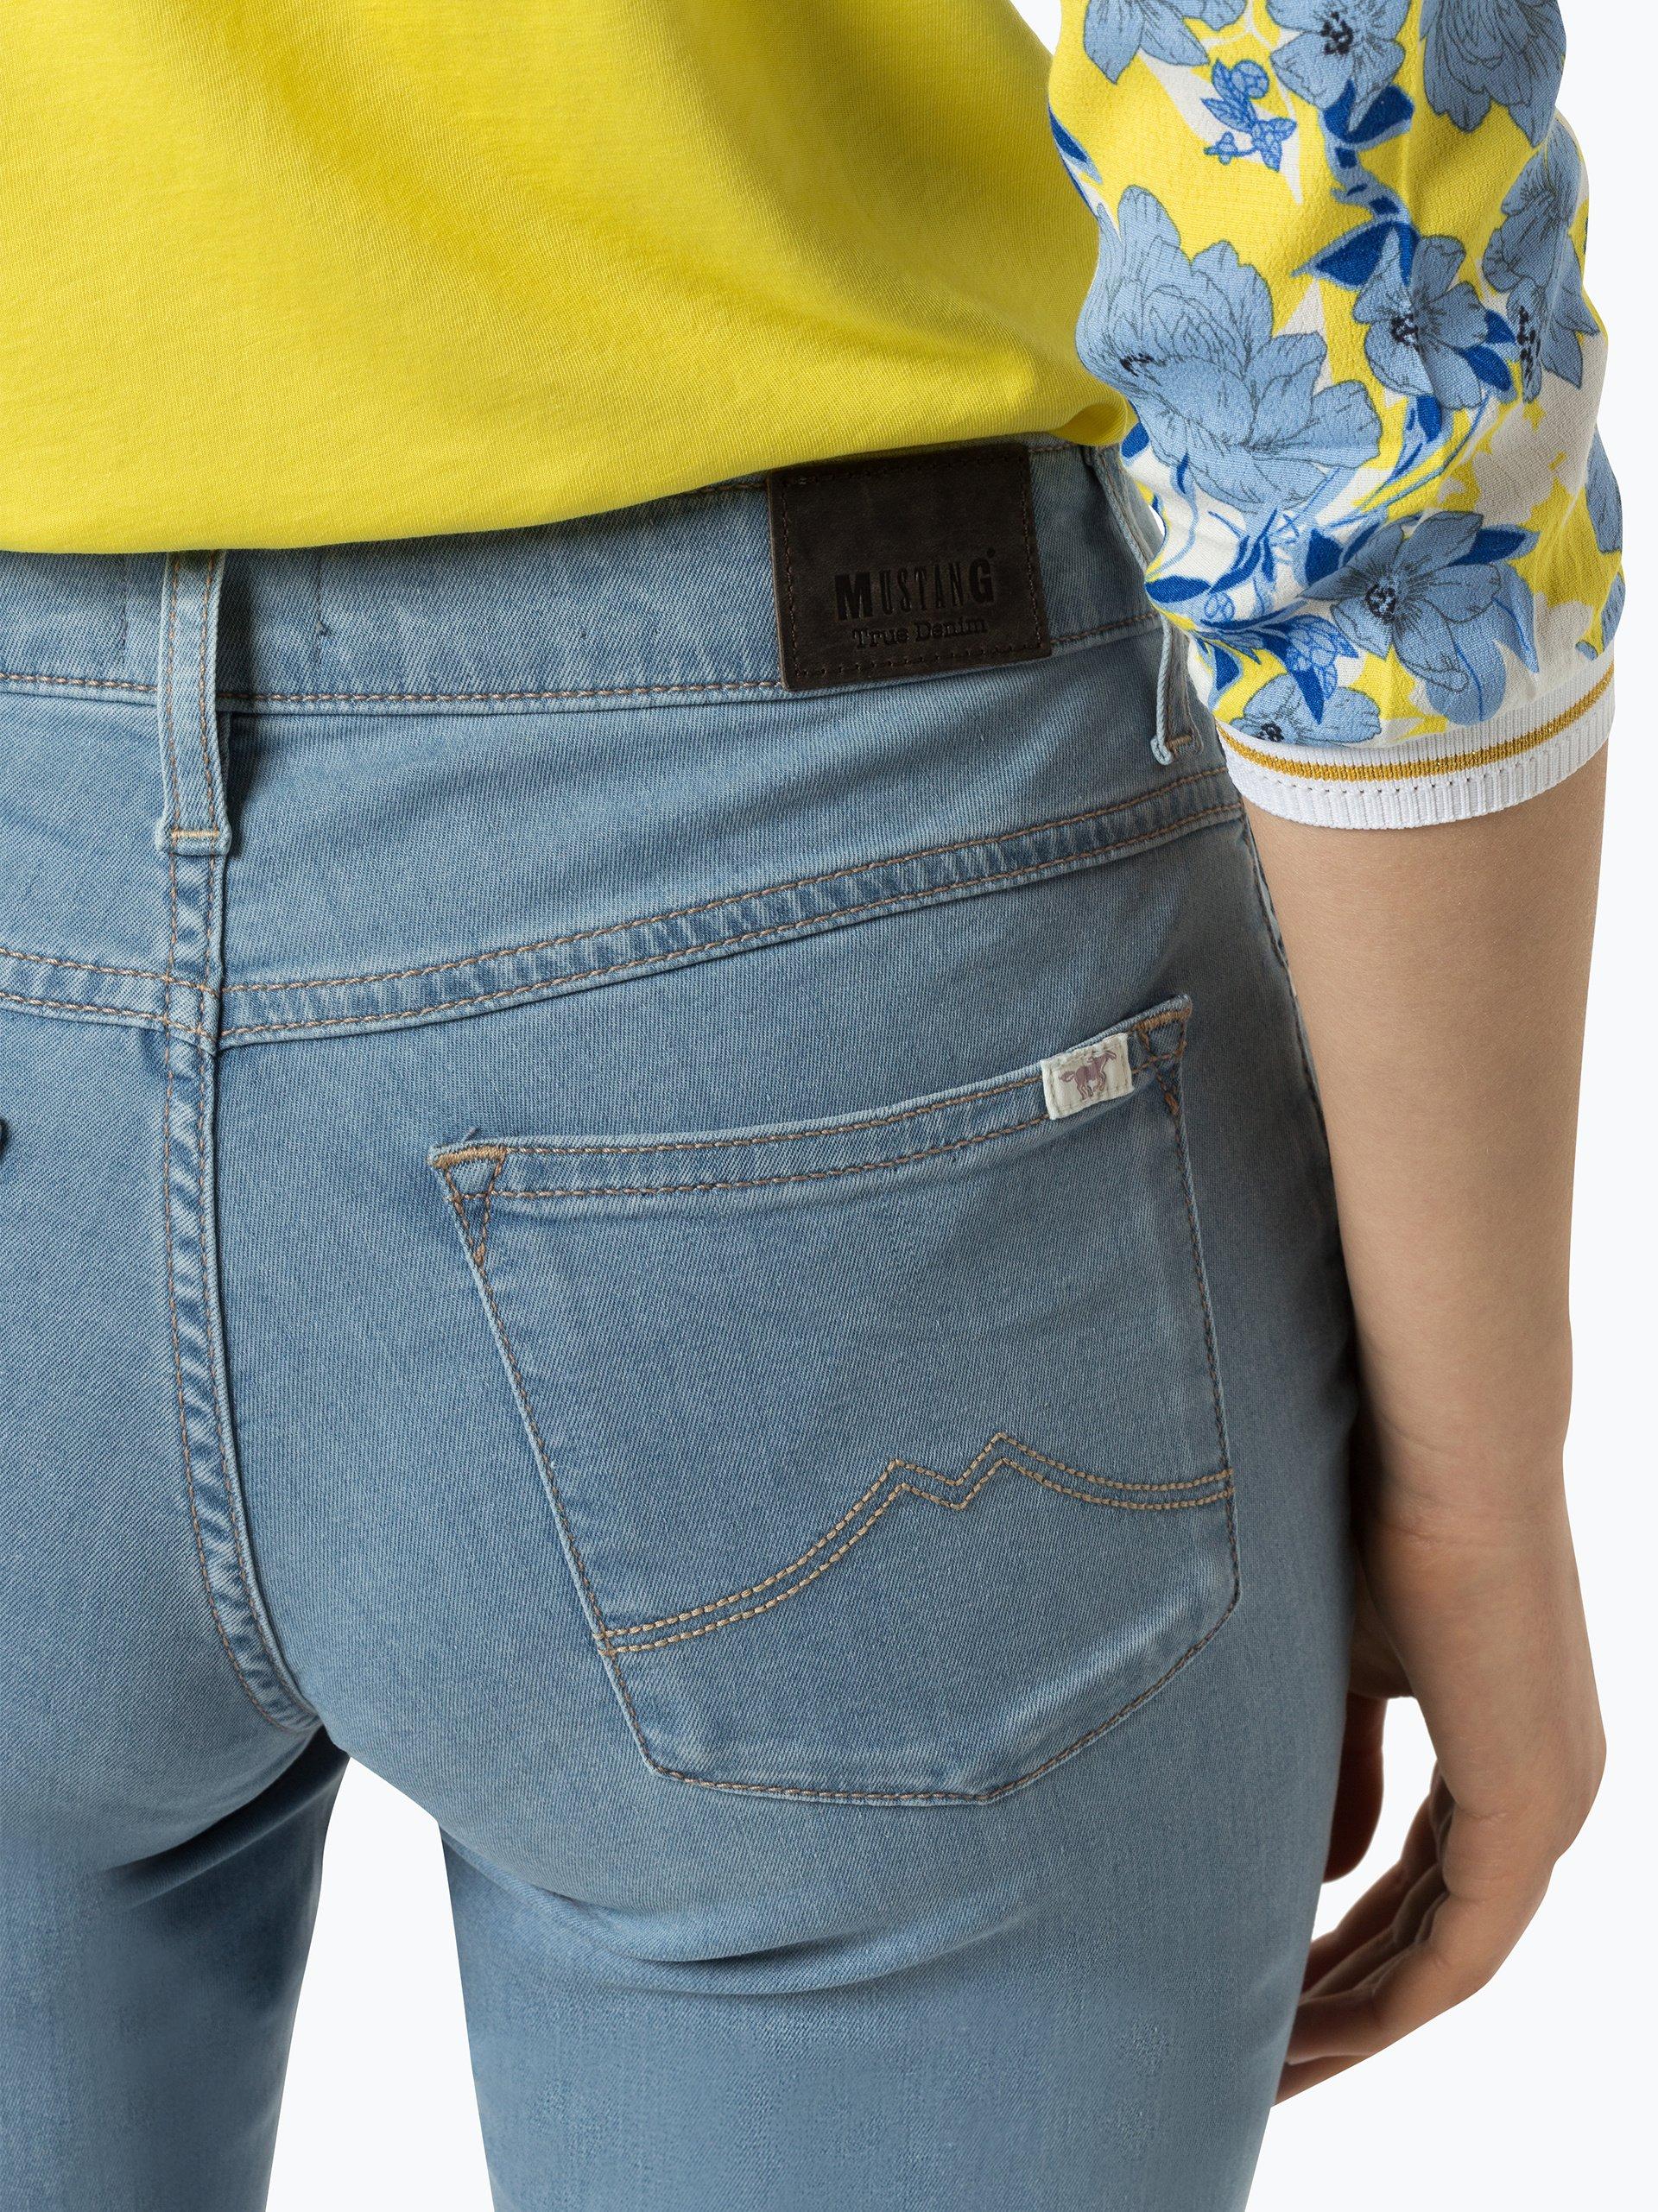 Mustang Damen Jeans - Sissy Slim